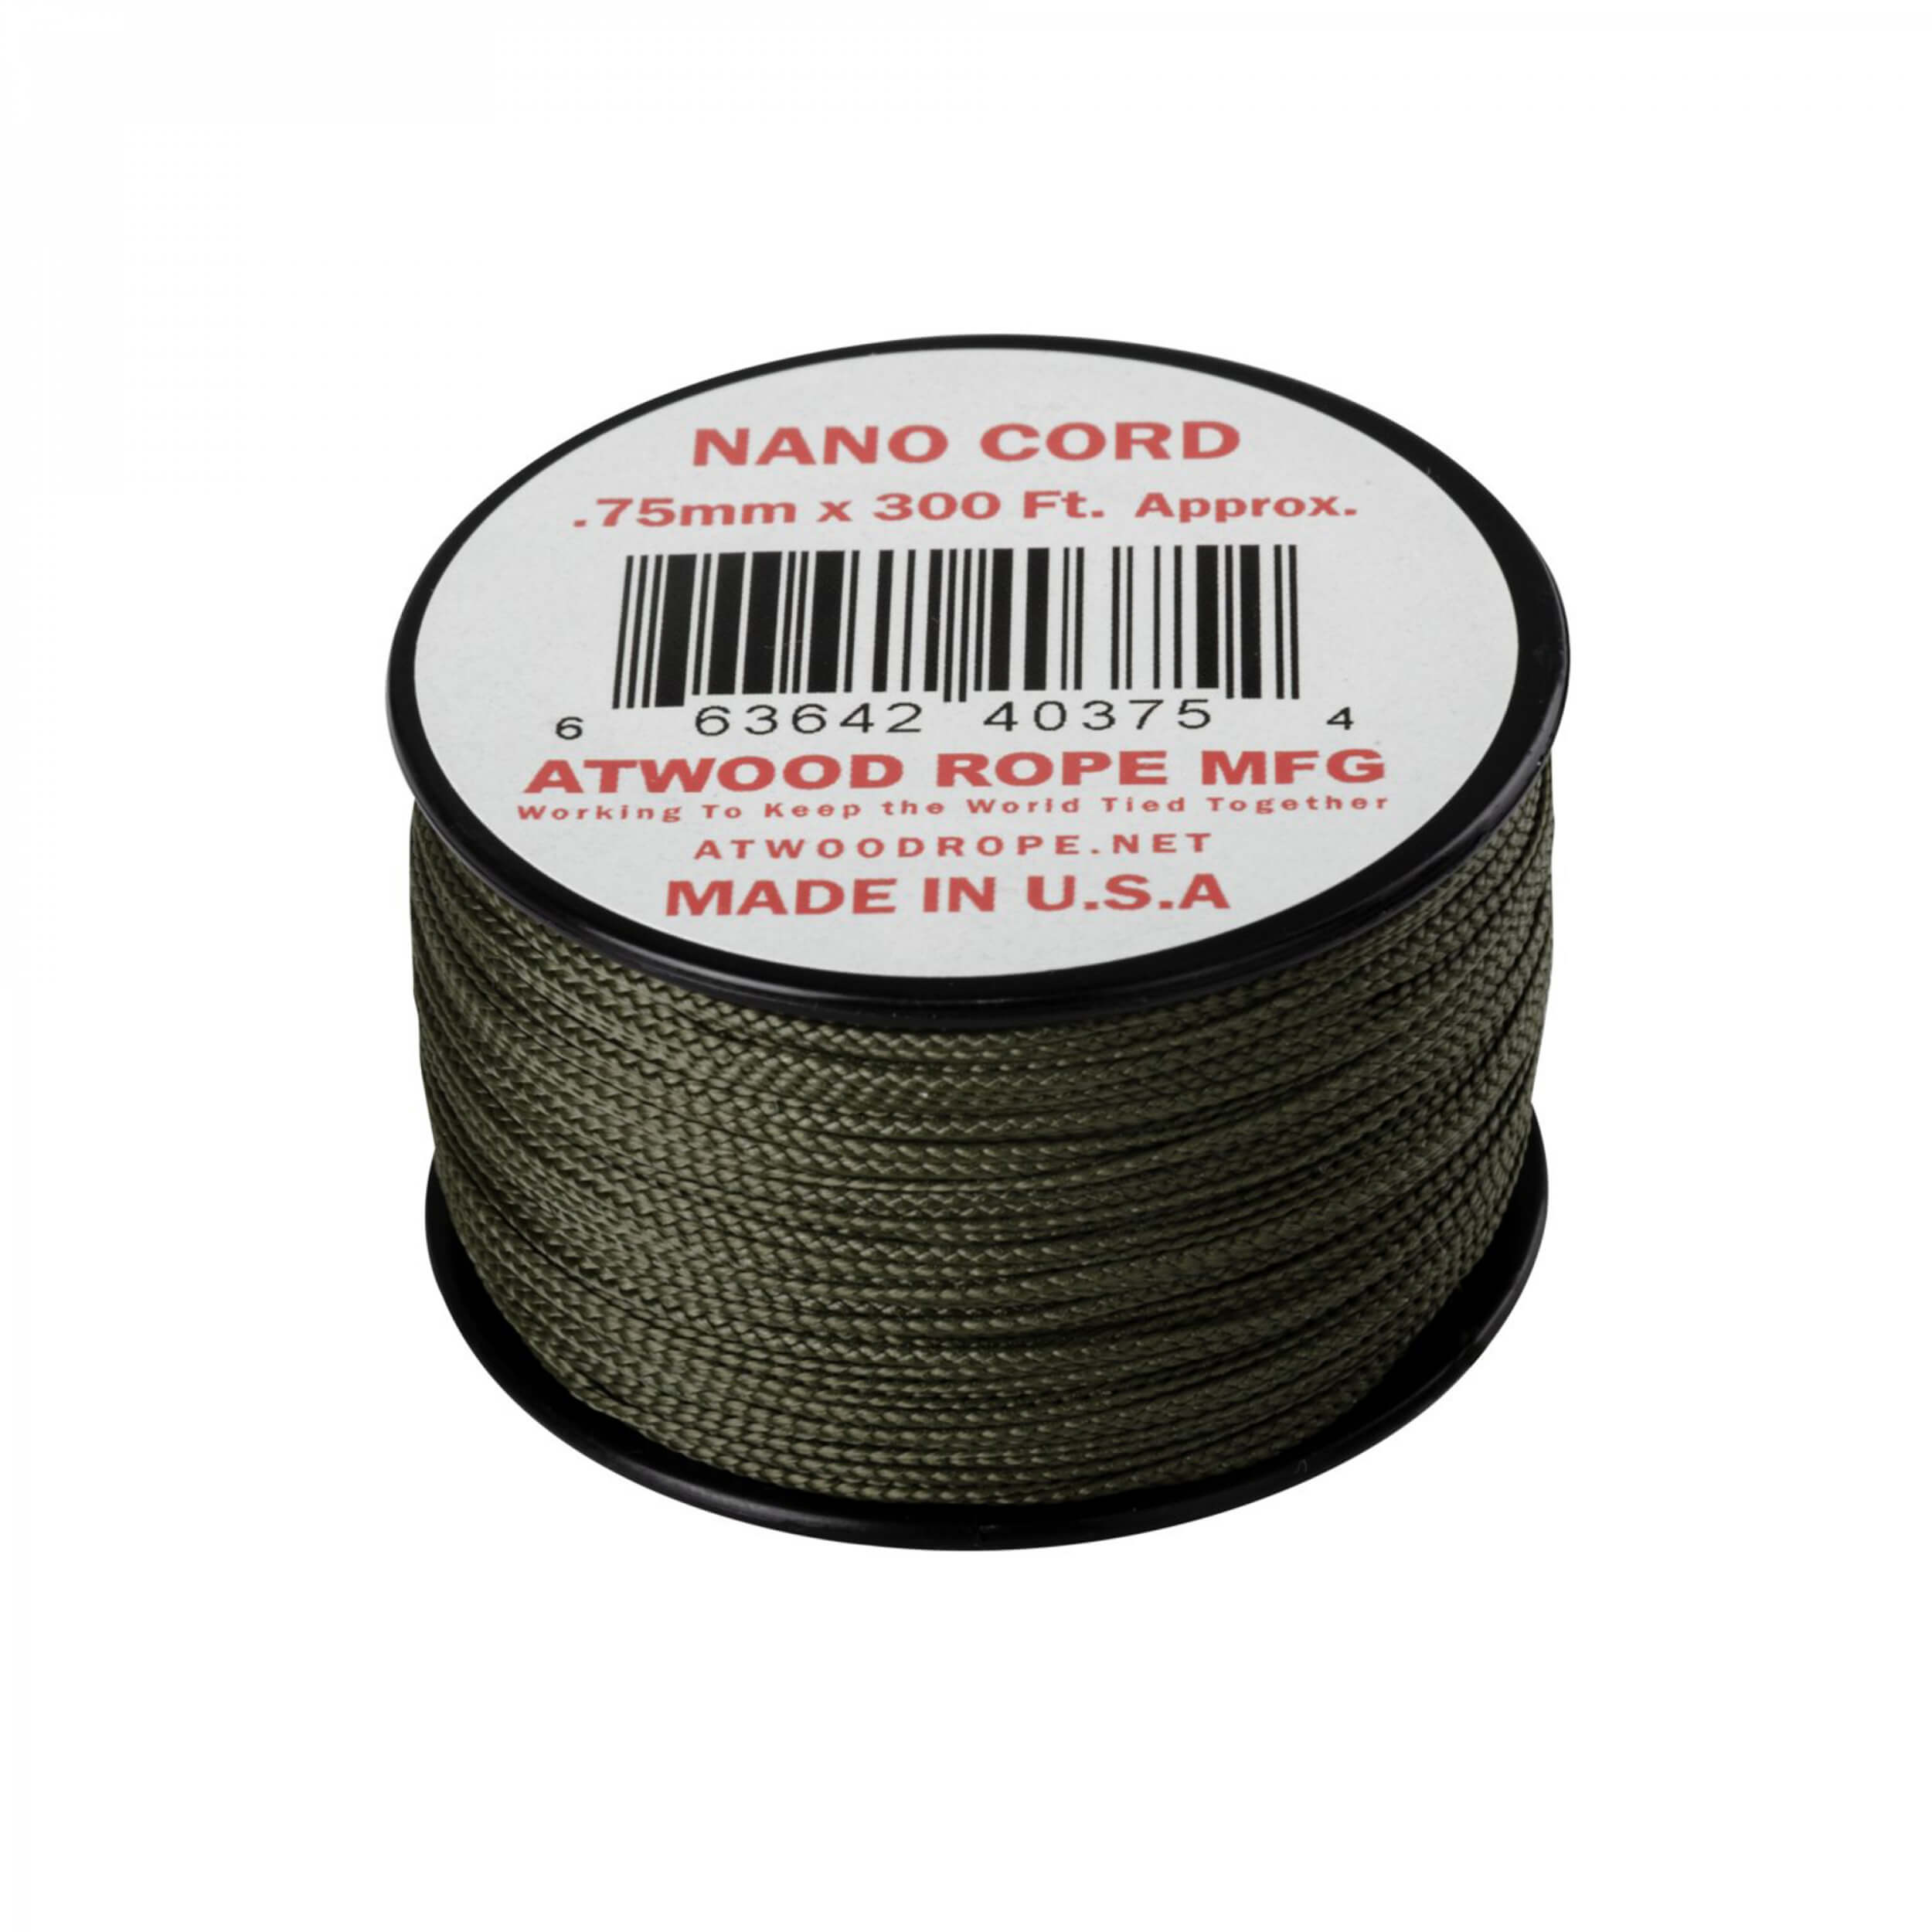 Helikon-Tex Nano Cord (300FT) olive drab